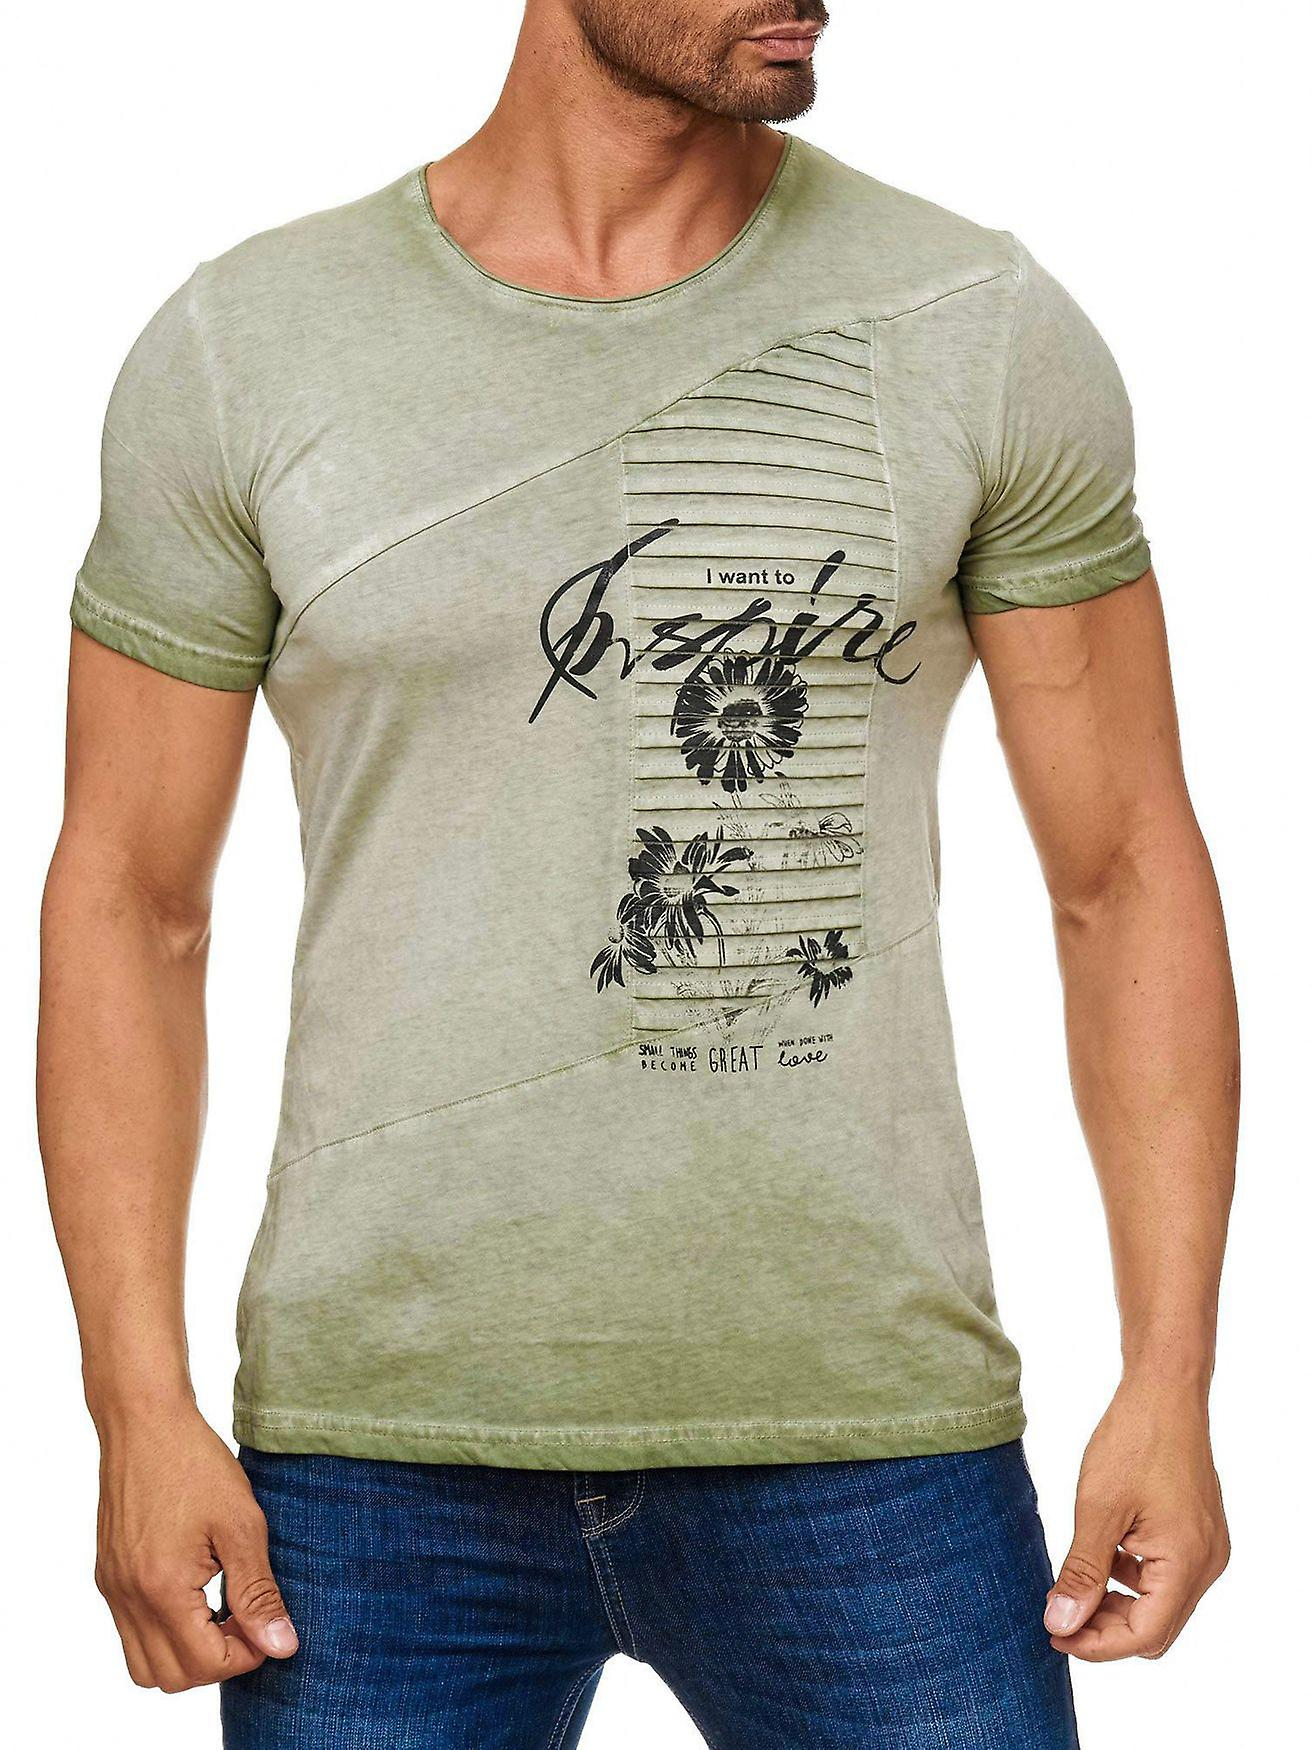 Mäns T shirt blommig blommig Rose Biker Print Kortärmad skjorta Font Club